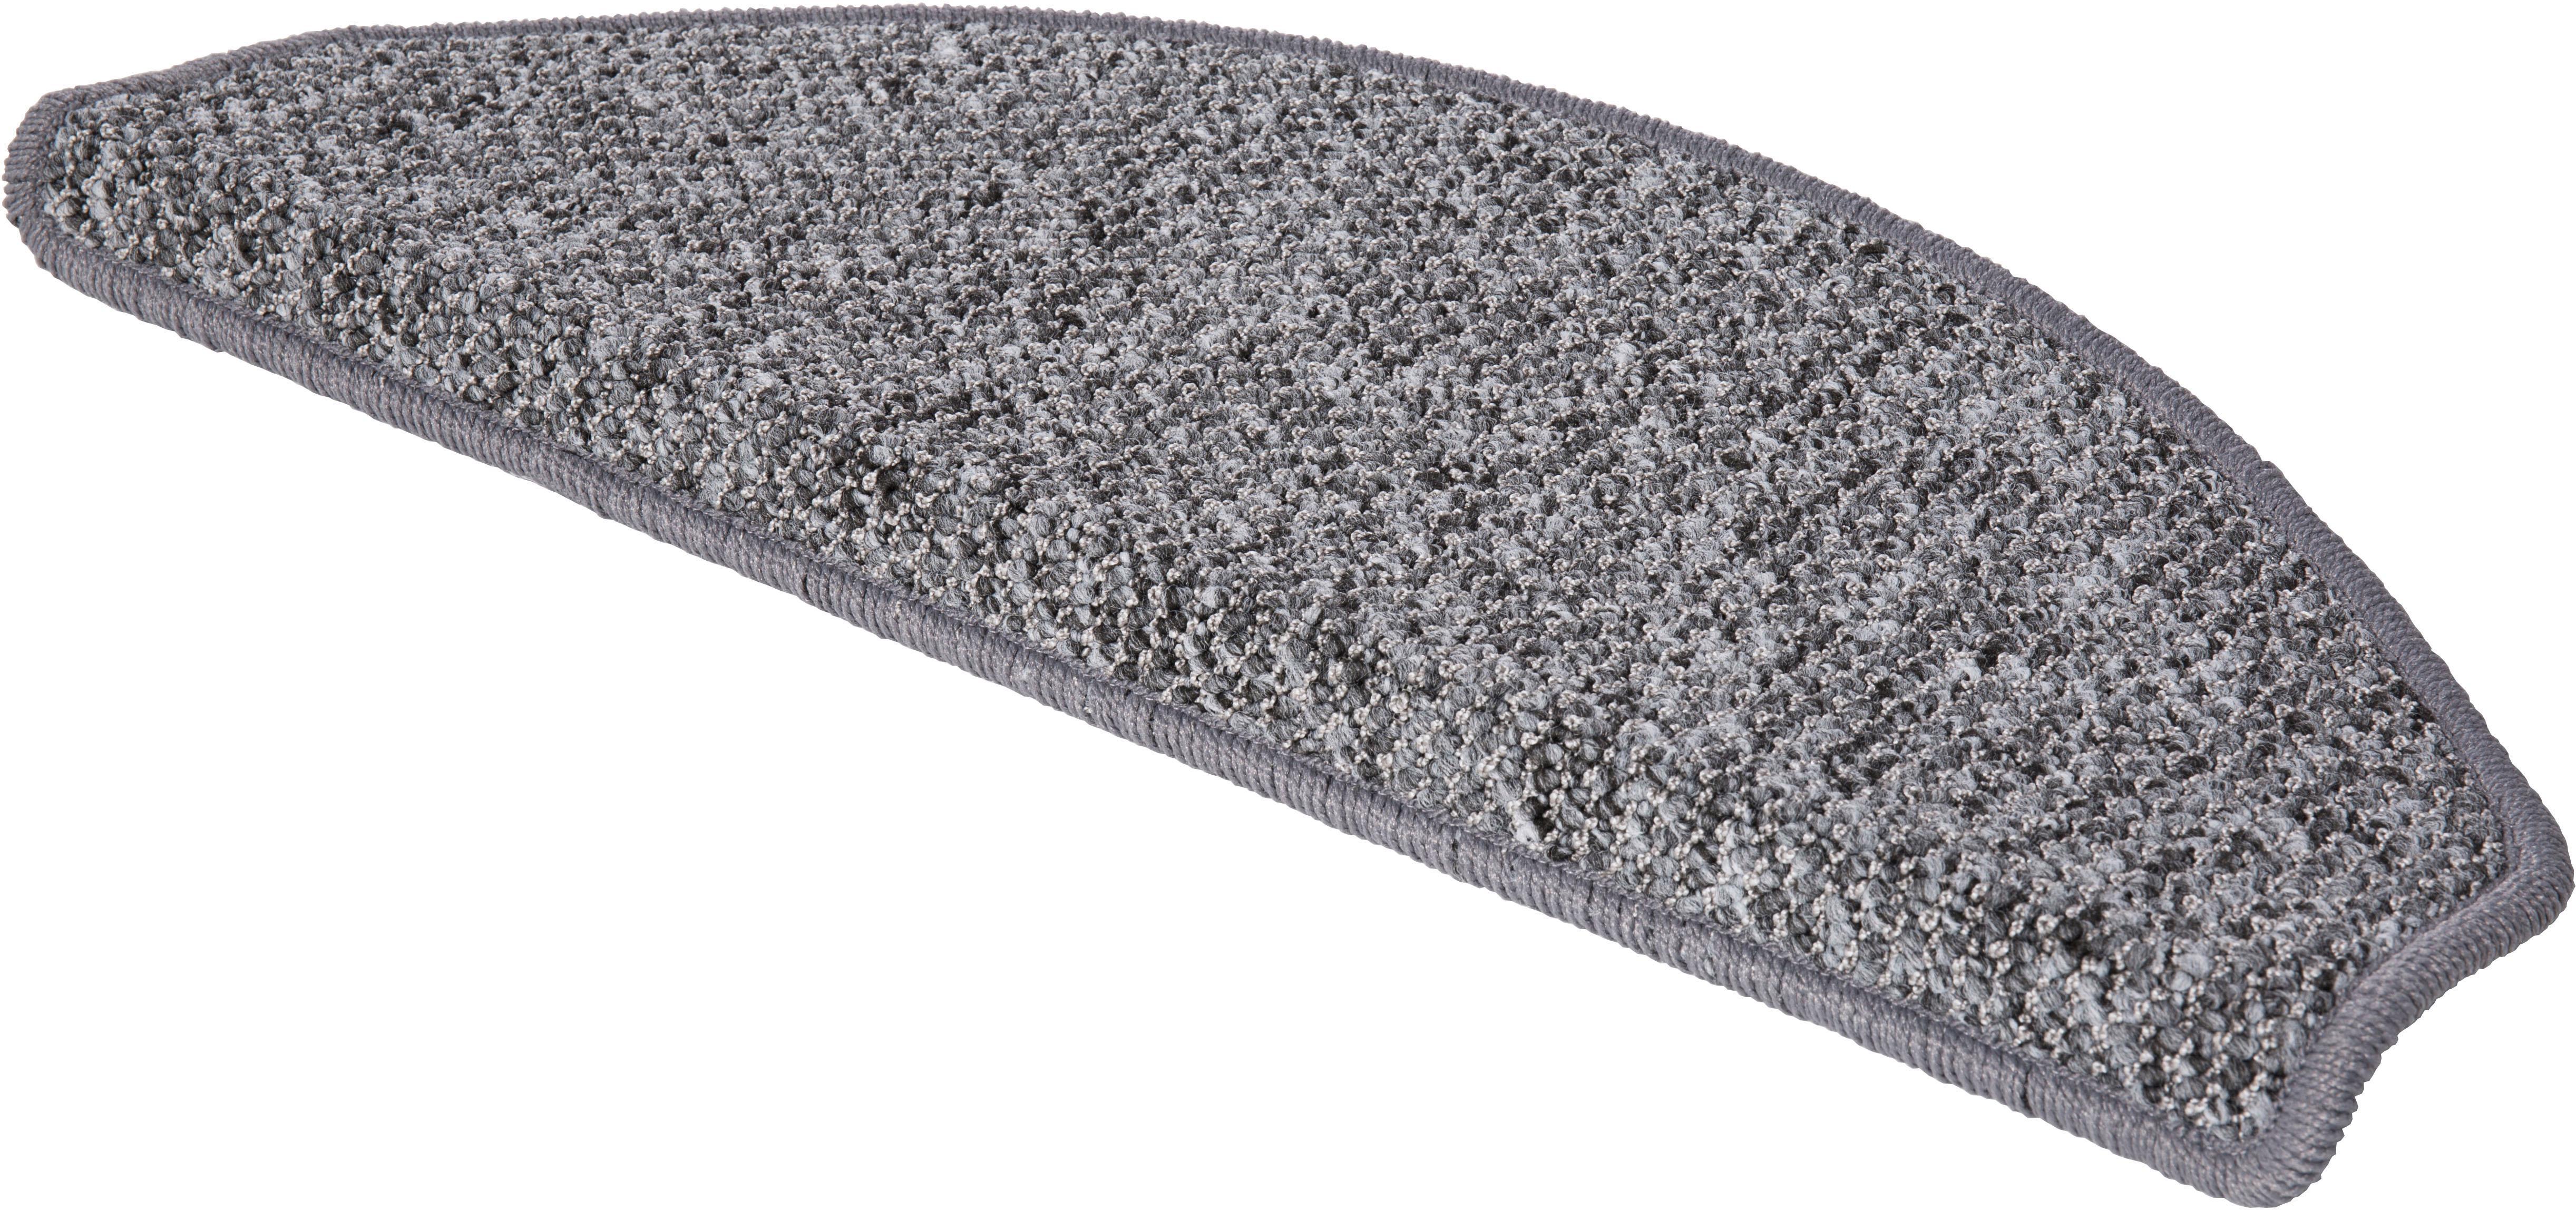 Stufenmatte Darlington LUXOR living stufenförmig Höhe 5 mm maschinell getuftet